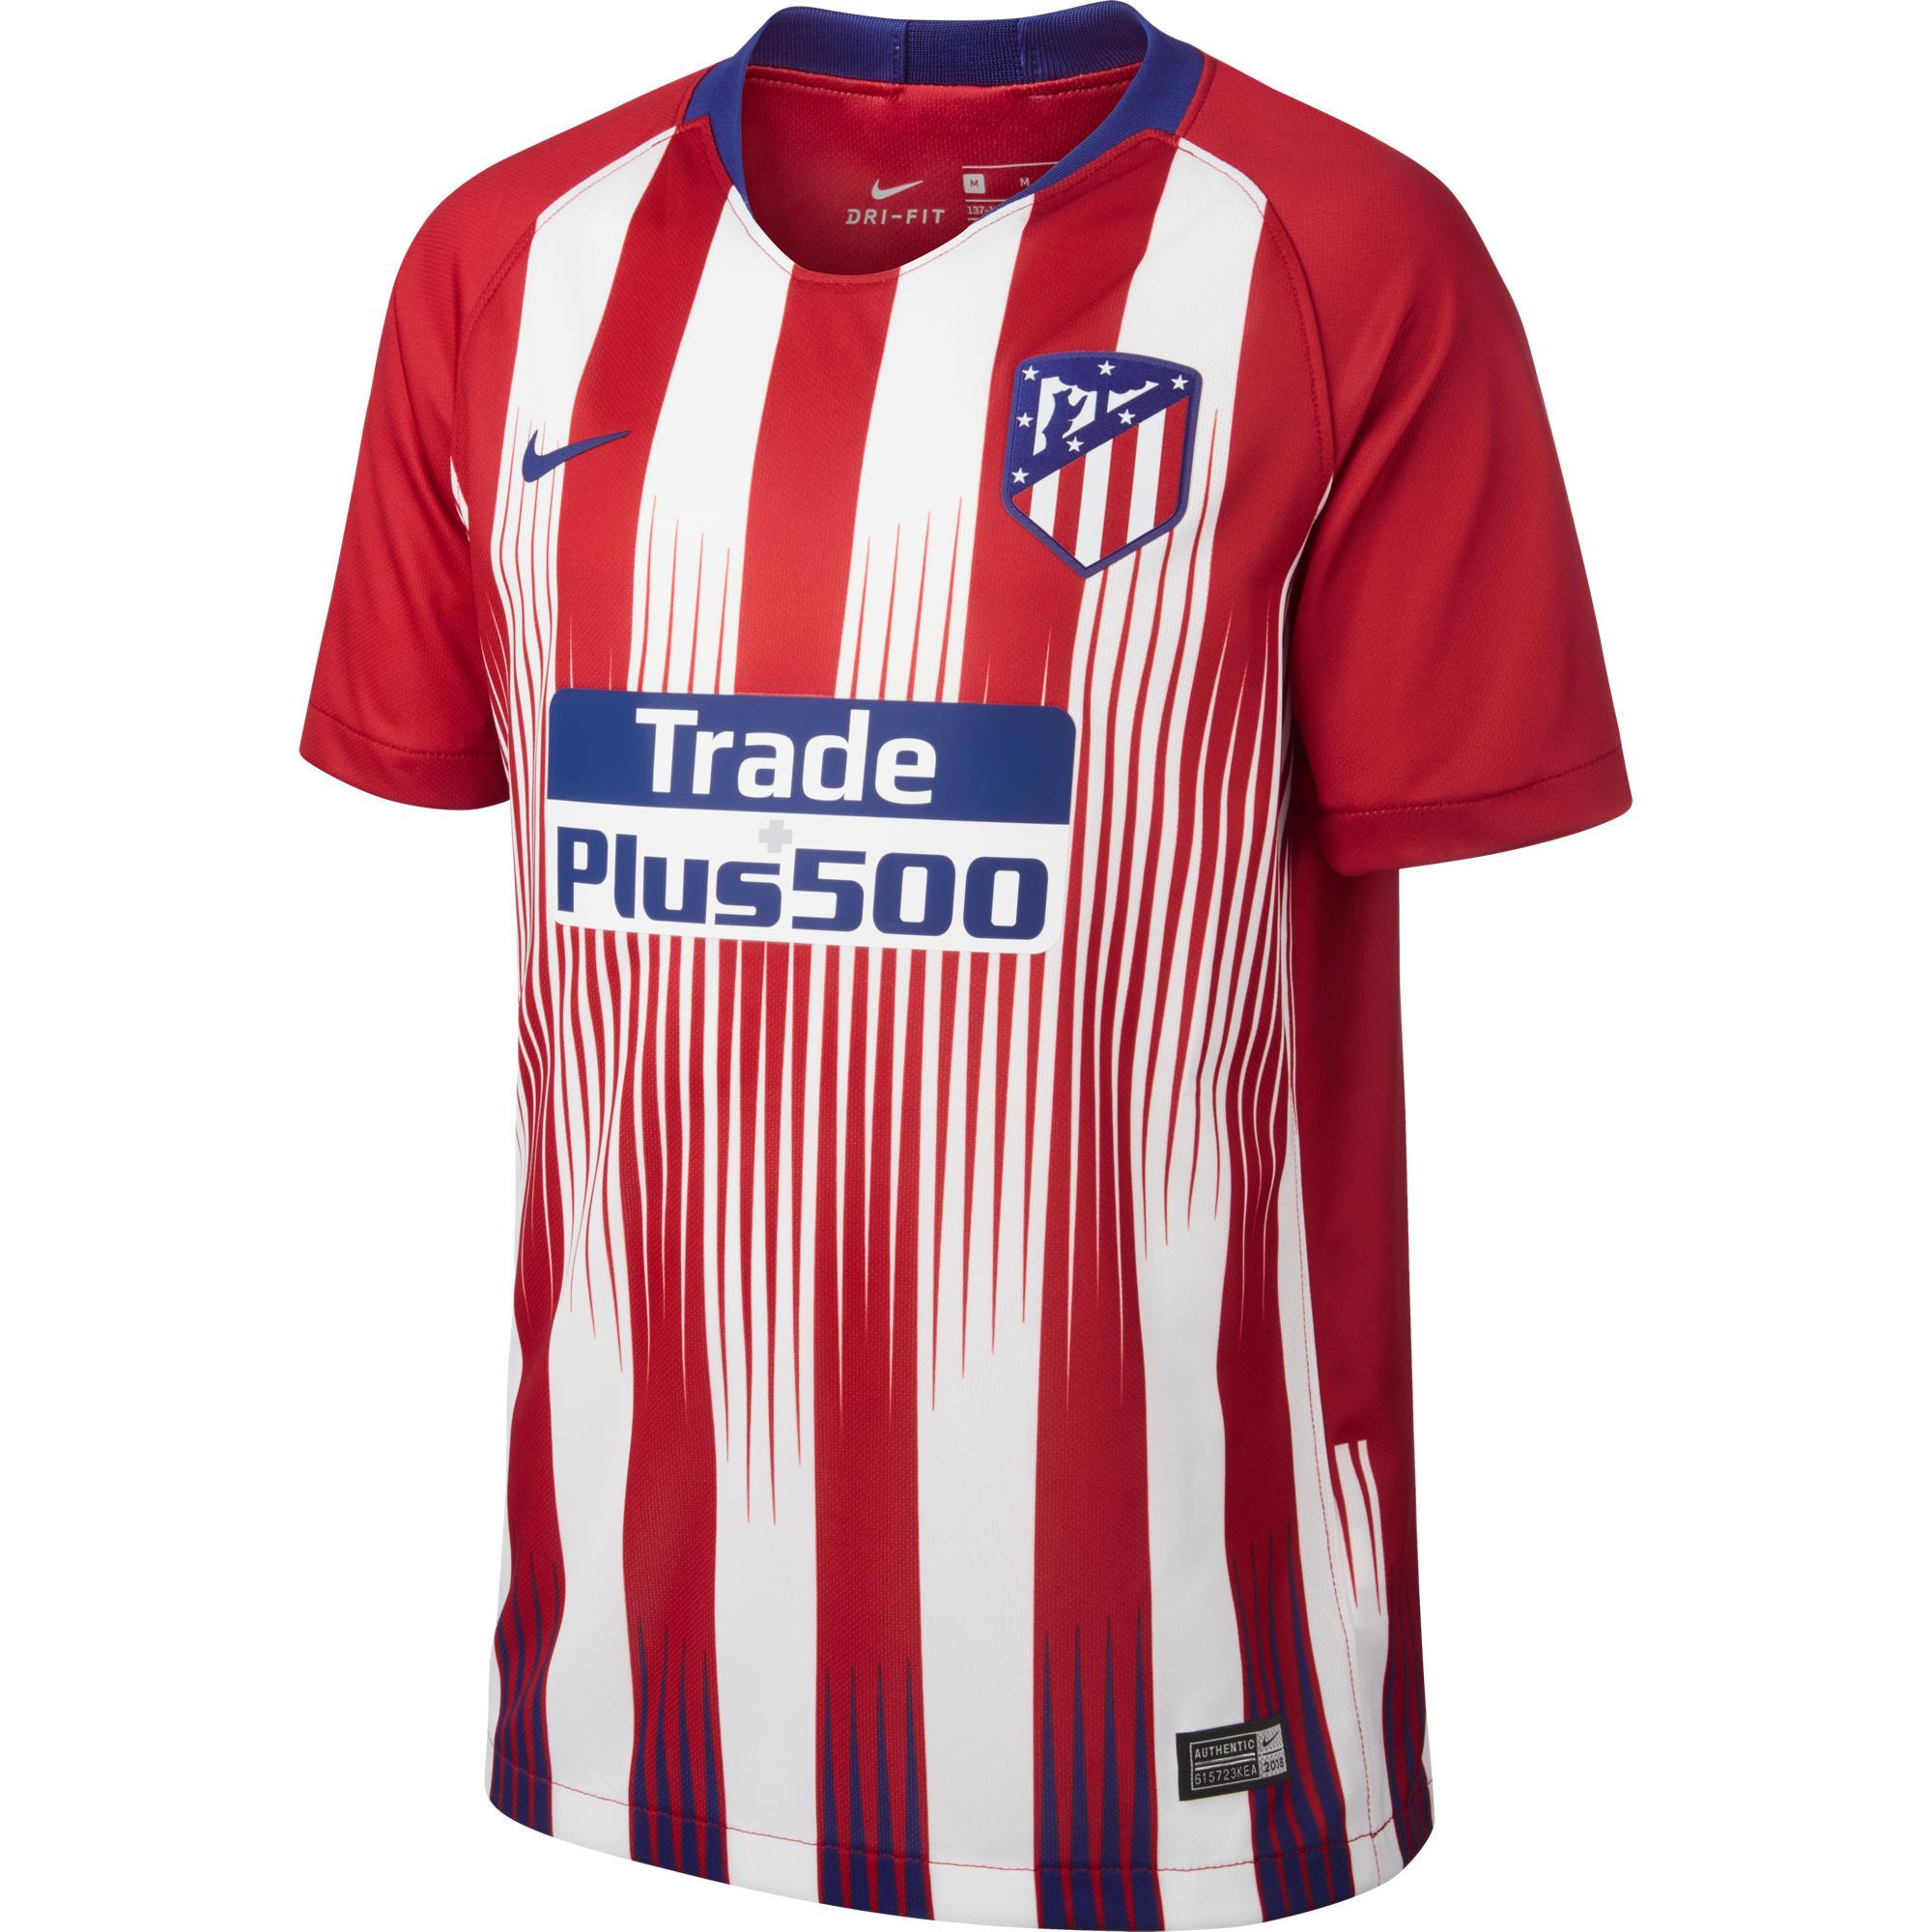 Camiseta Oficial Atlético de Madrid 2018 19  59021f54b226f